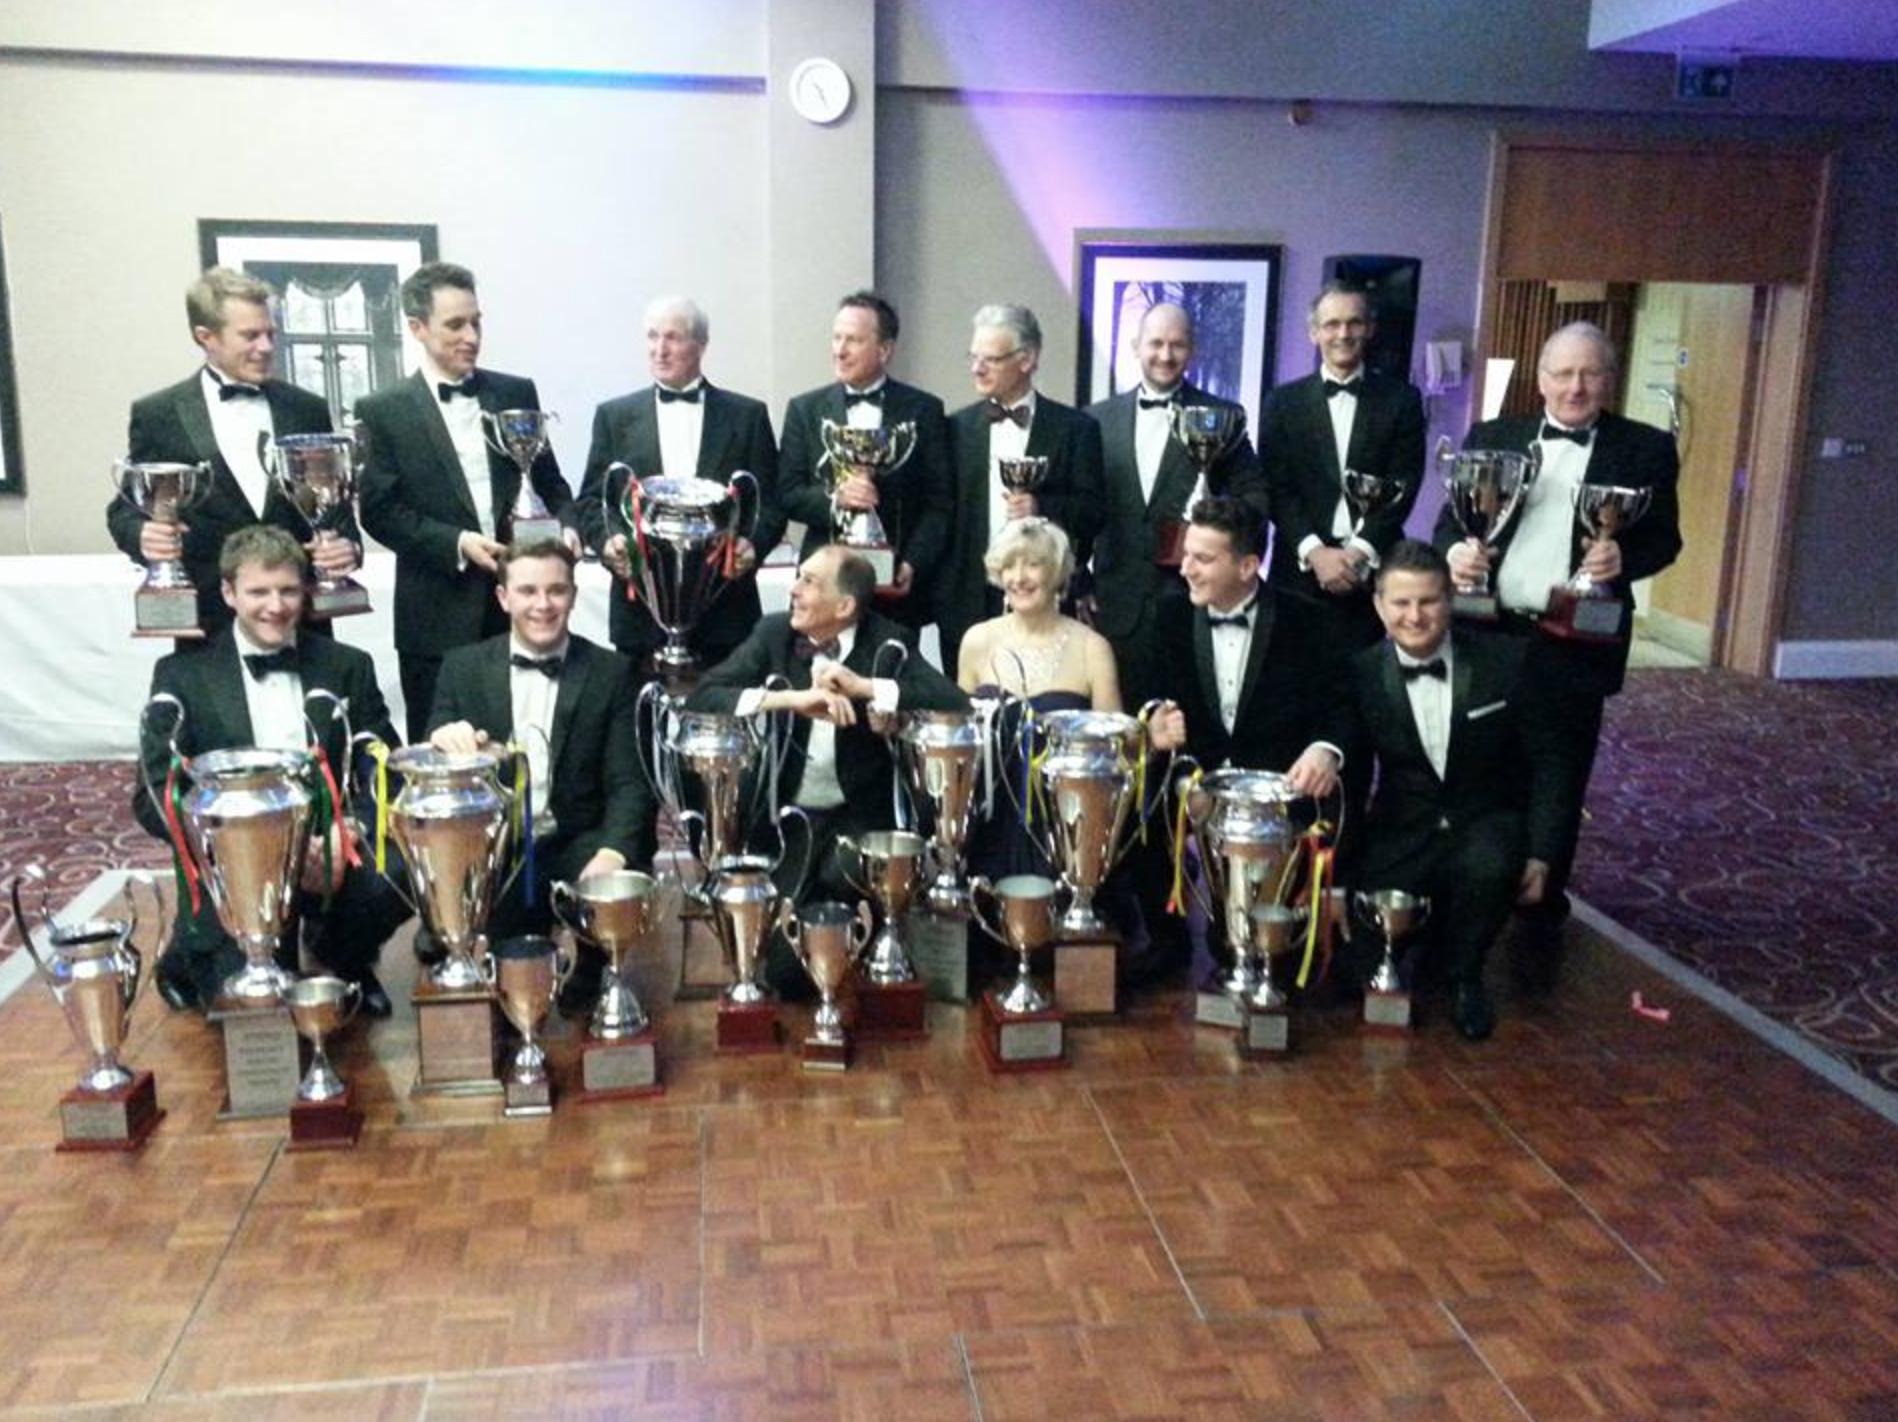 2016 Dinner Dance awards Sports 2000 Championship